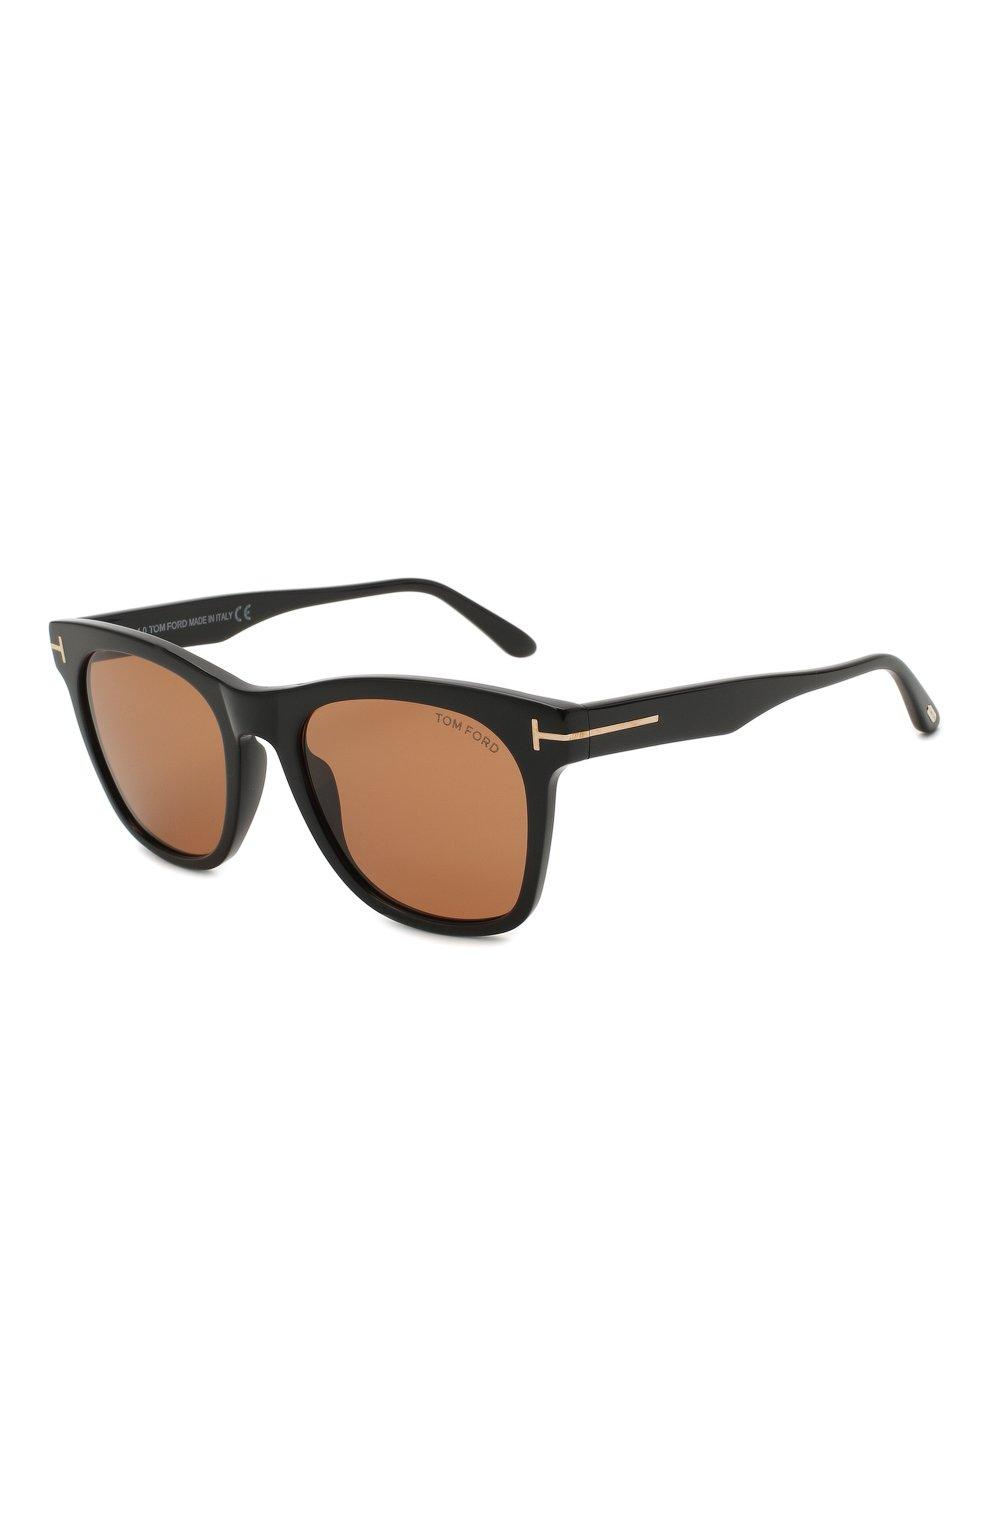 Мужские солнцезащитные очки TOM FORD коричневого цвета, арт. TF833 01E   Фото 1